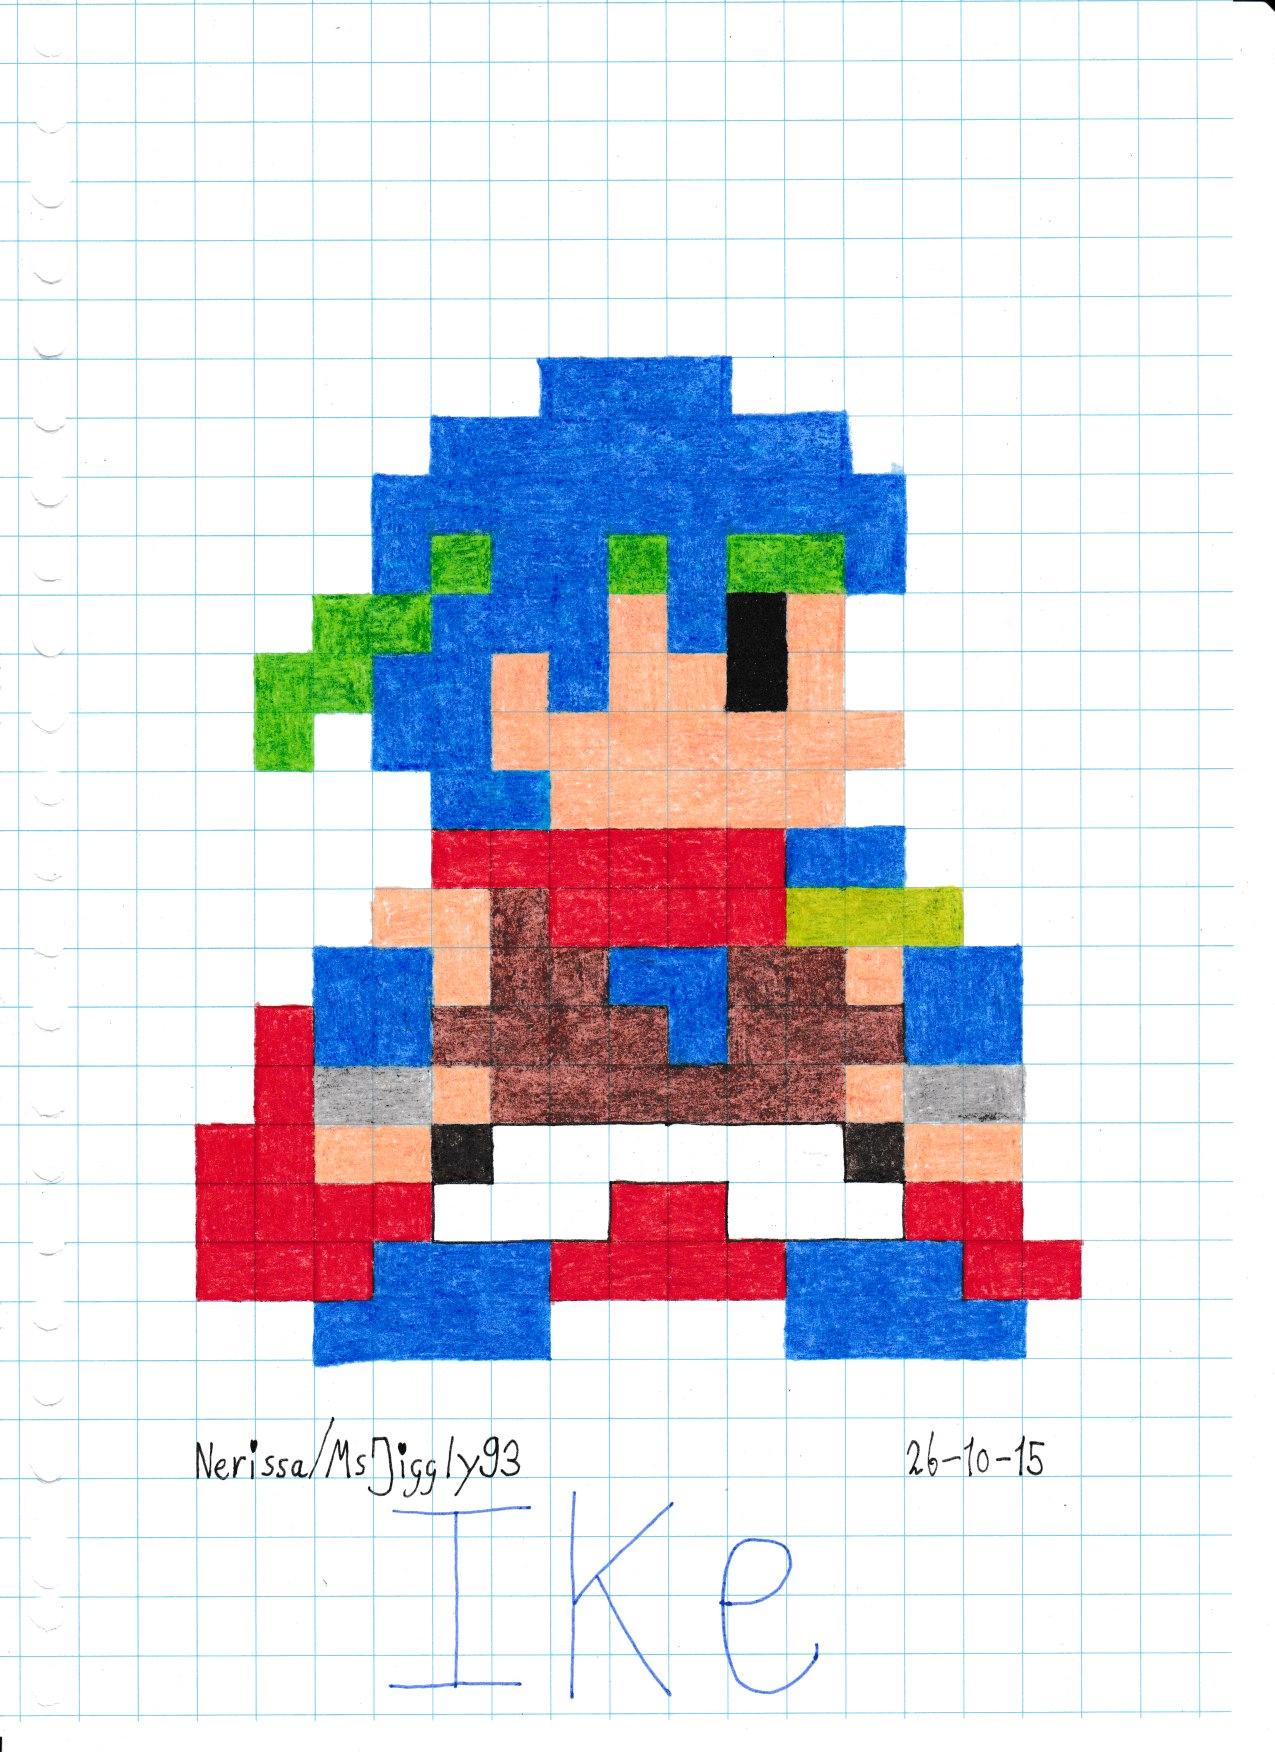 Squishy Duck Super Mario Maker 4 : Ike (8-Bit) by MsJiggly93 on DeviantArt